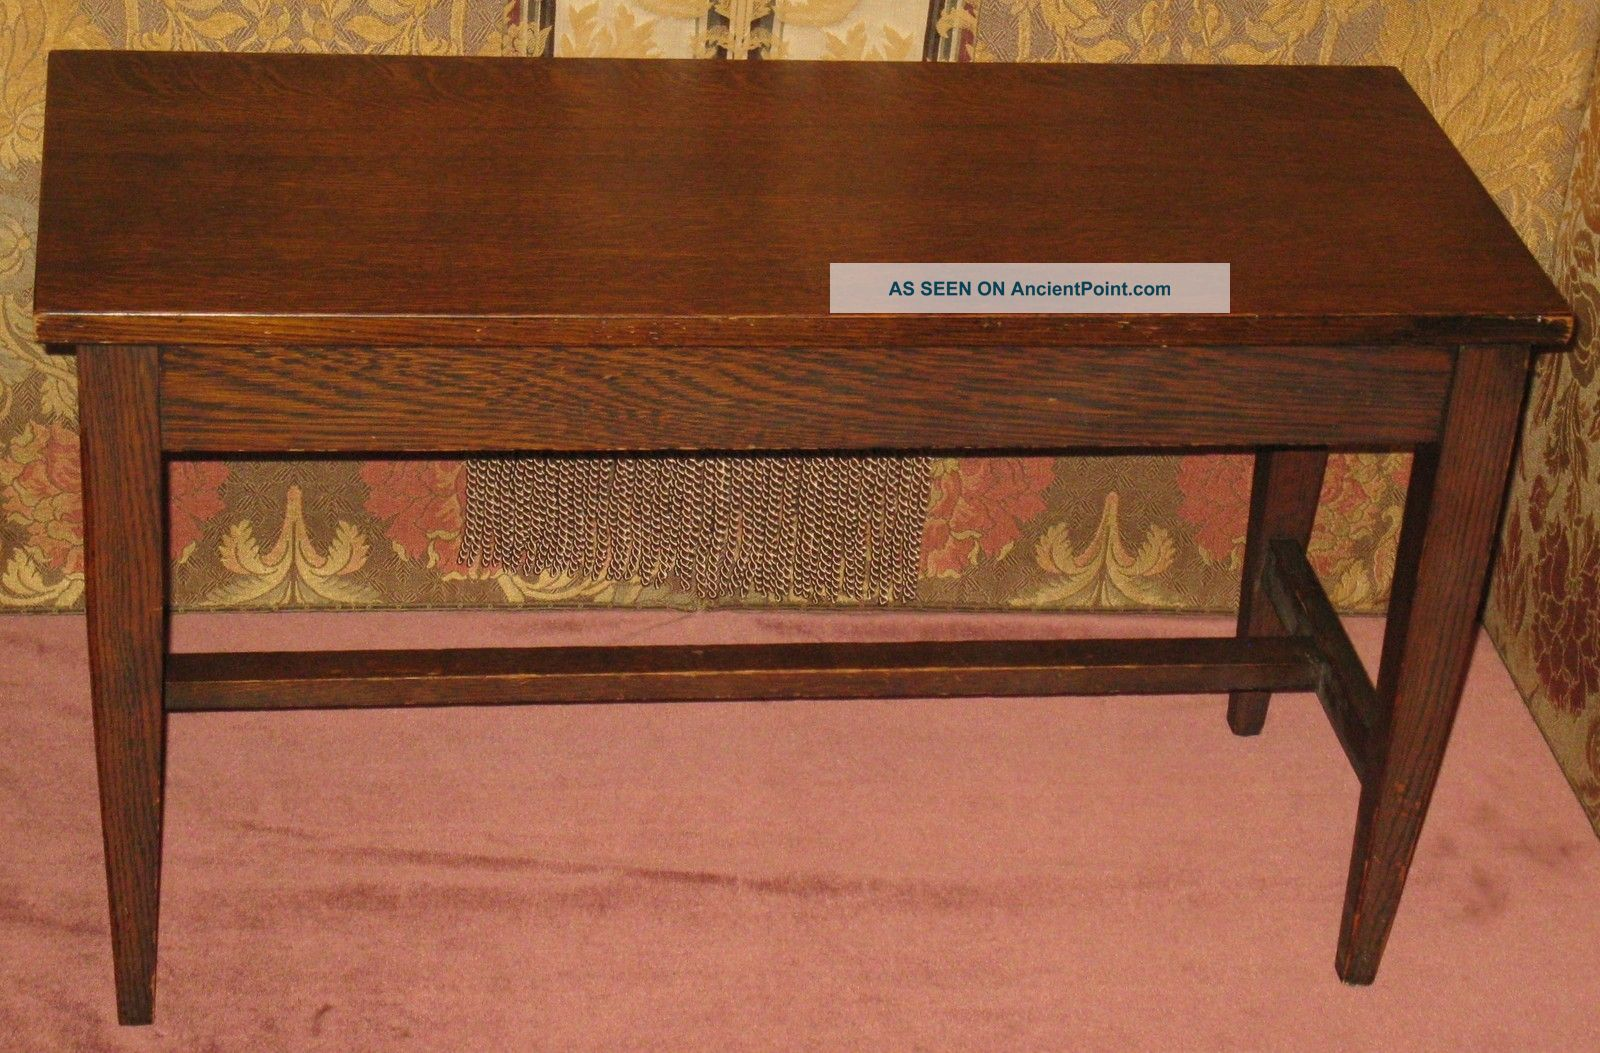 Antique Solid Oak Piano Organ Hinged Lift Top Bench W/original Finish Ca 1890s 1800-1899 photo